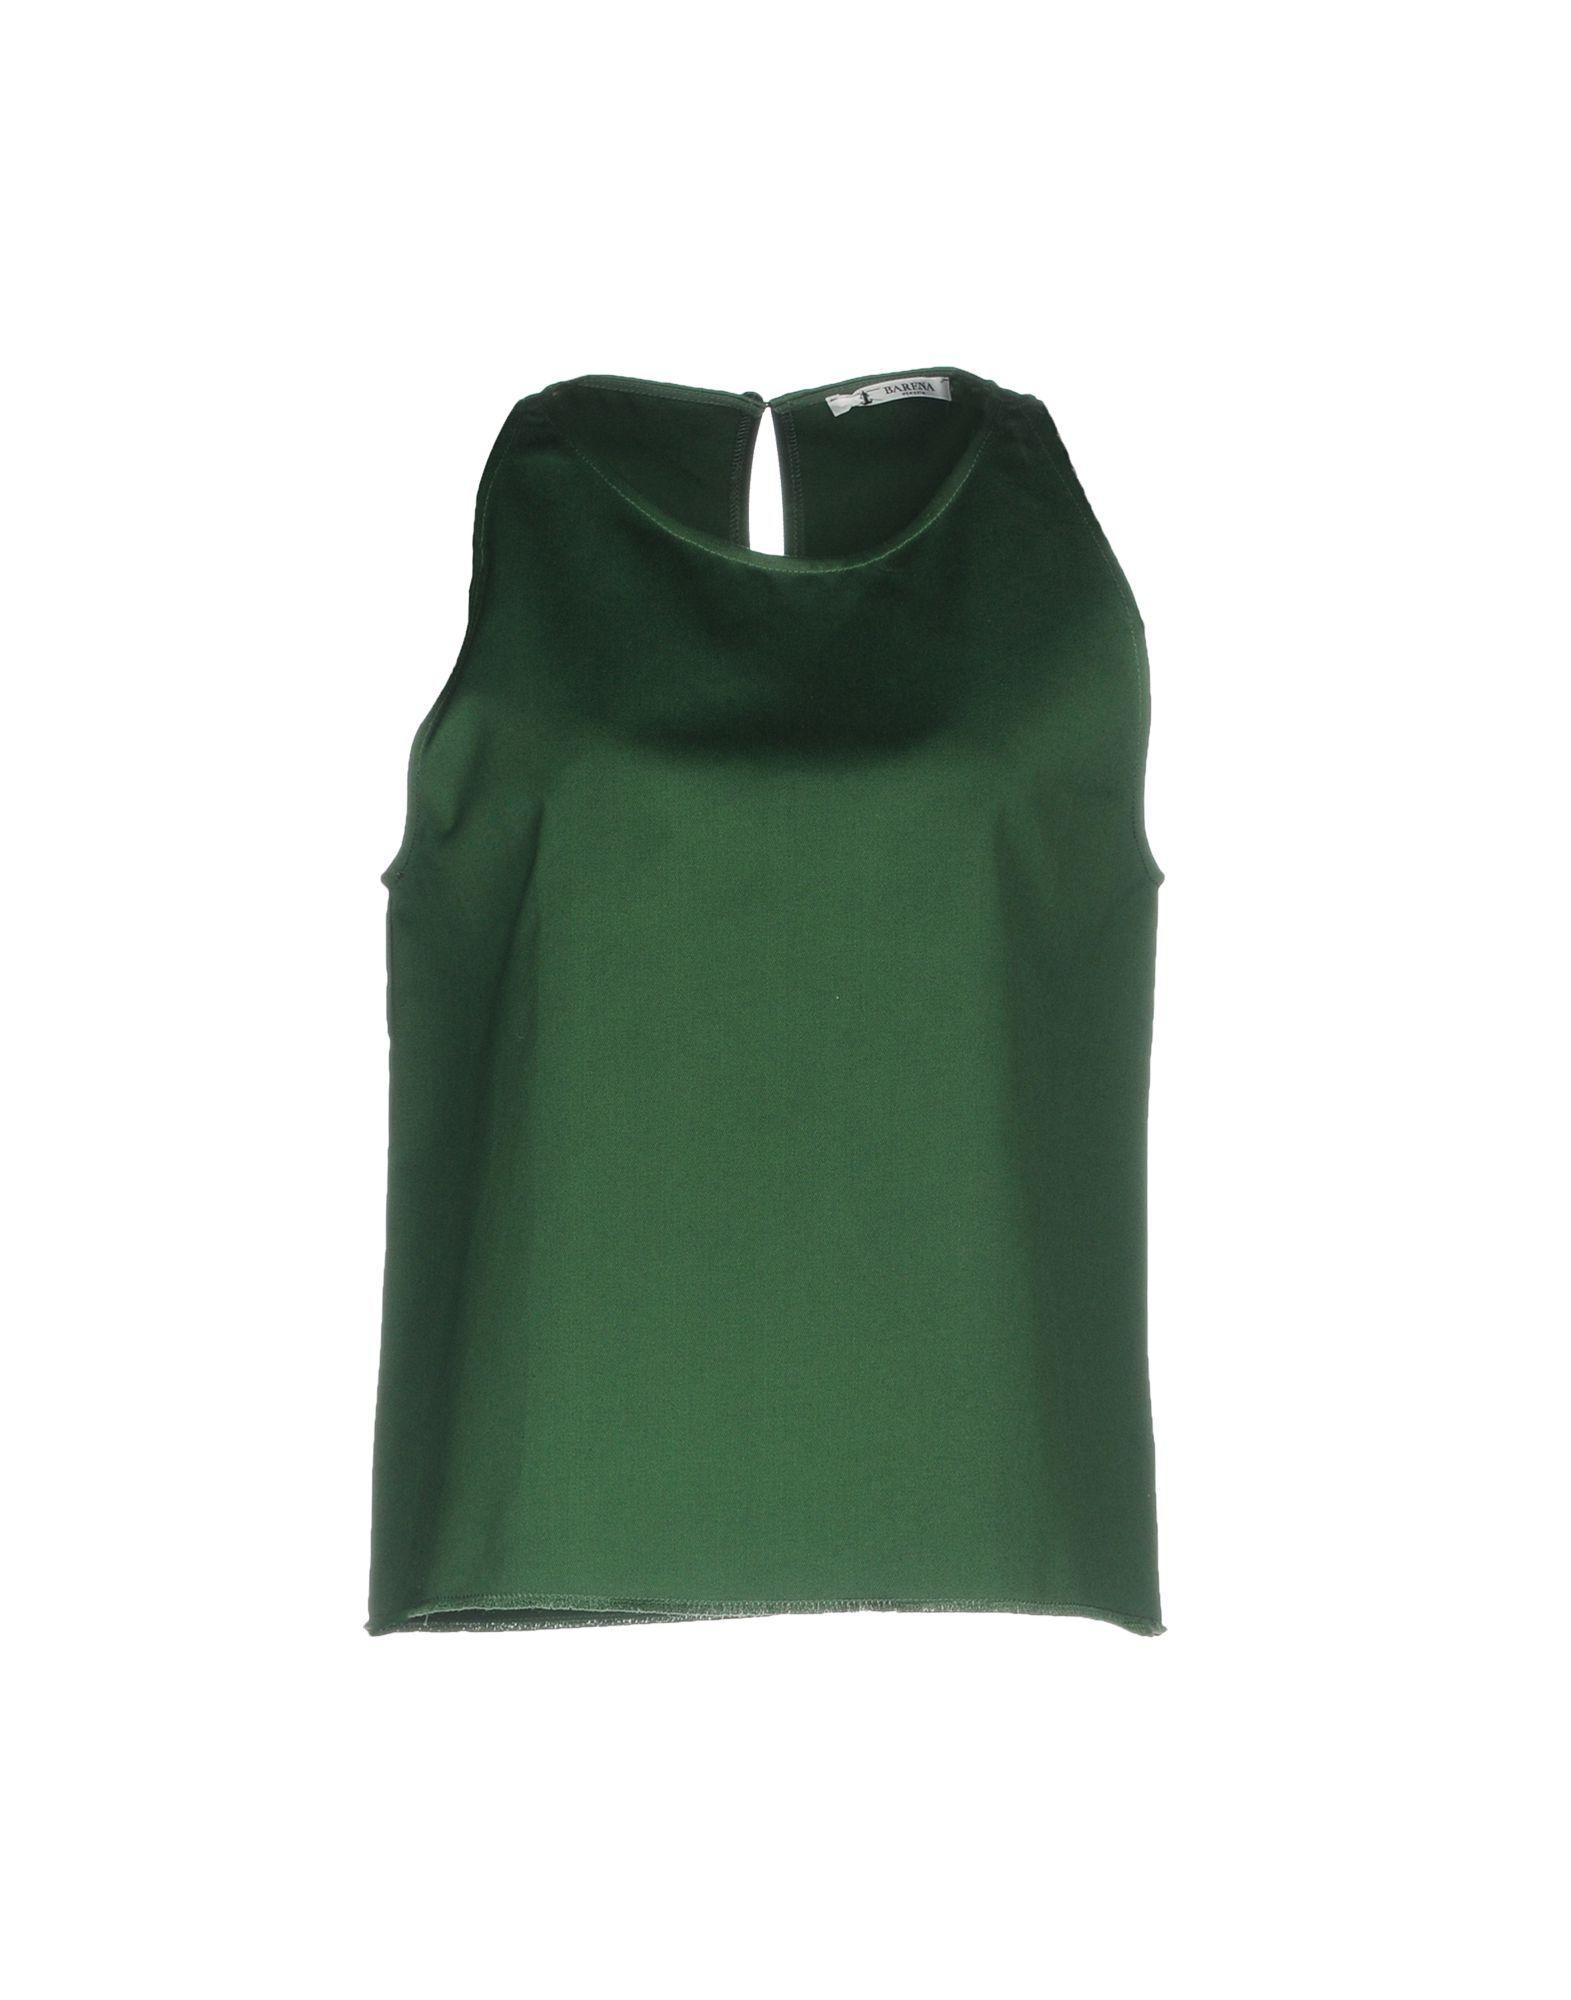 Topwear Barena Green Women's Cotton